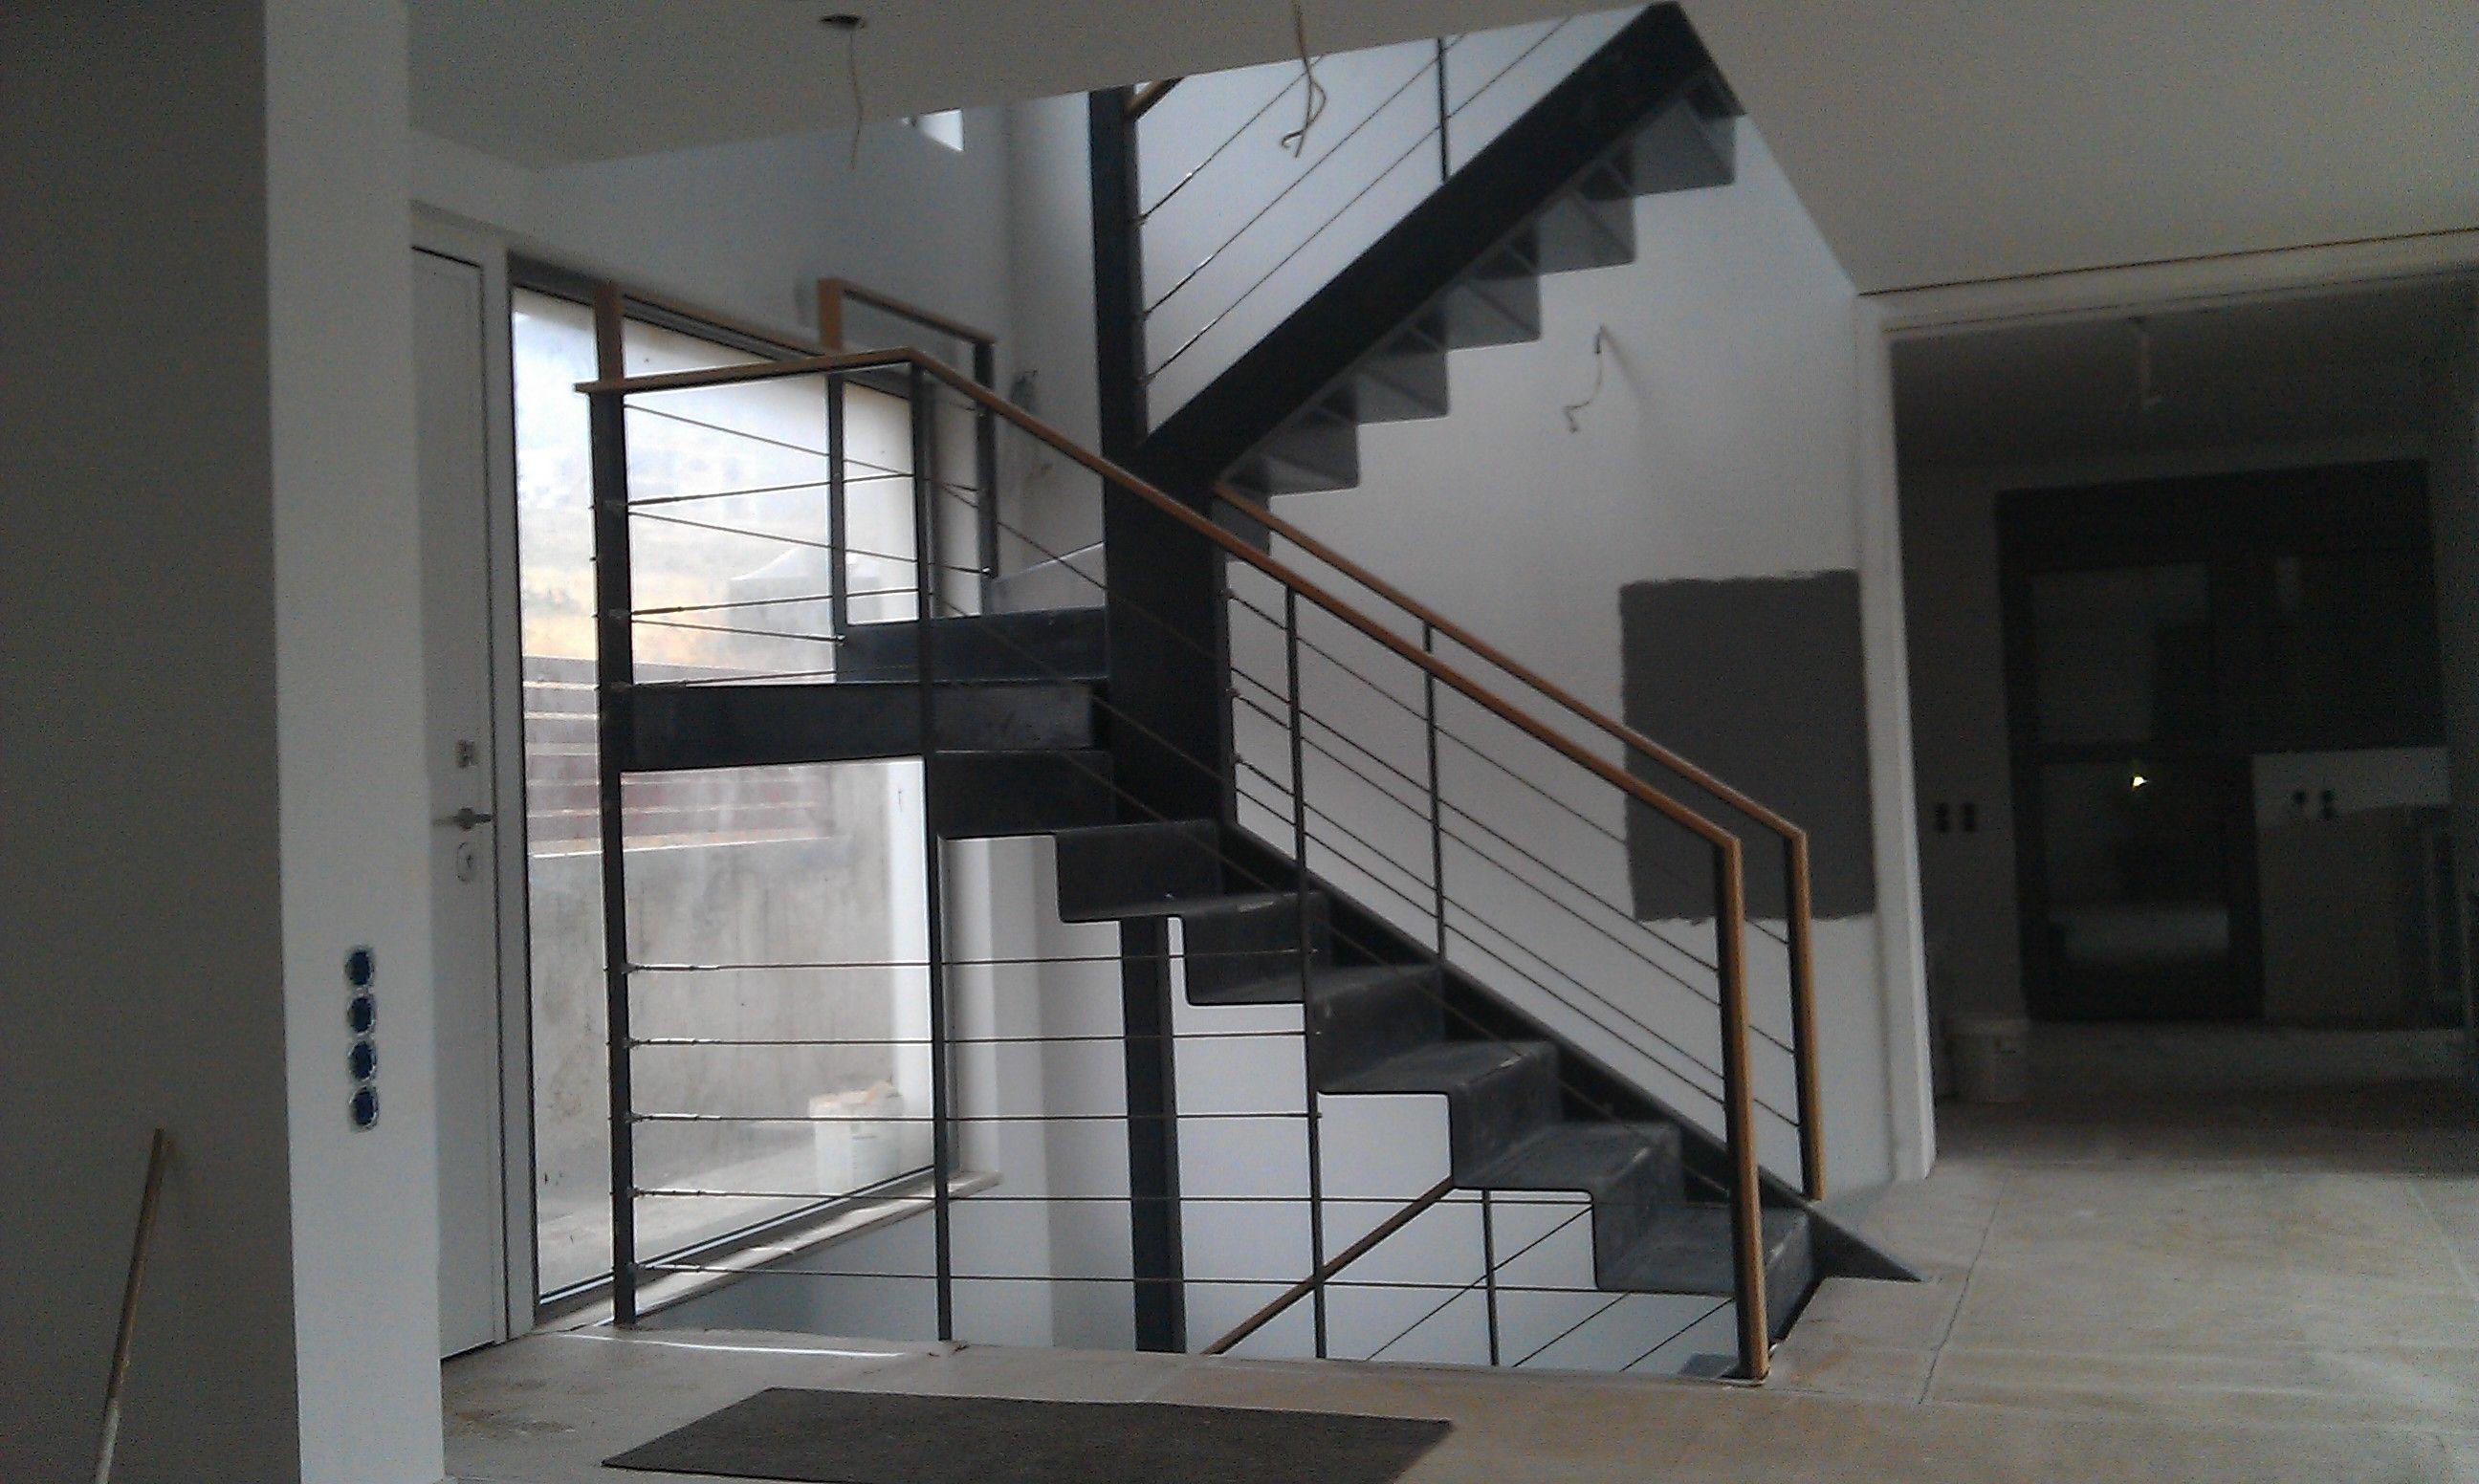 Stairs, Stairways, Ladder, Staircases, Stiles, Stairway